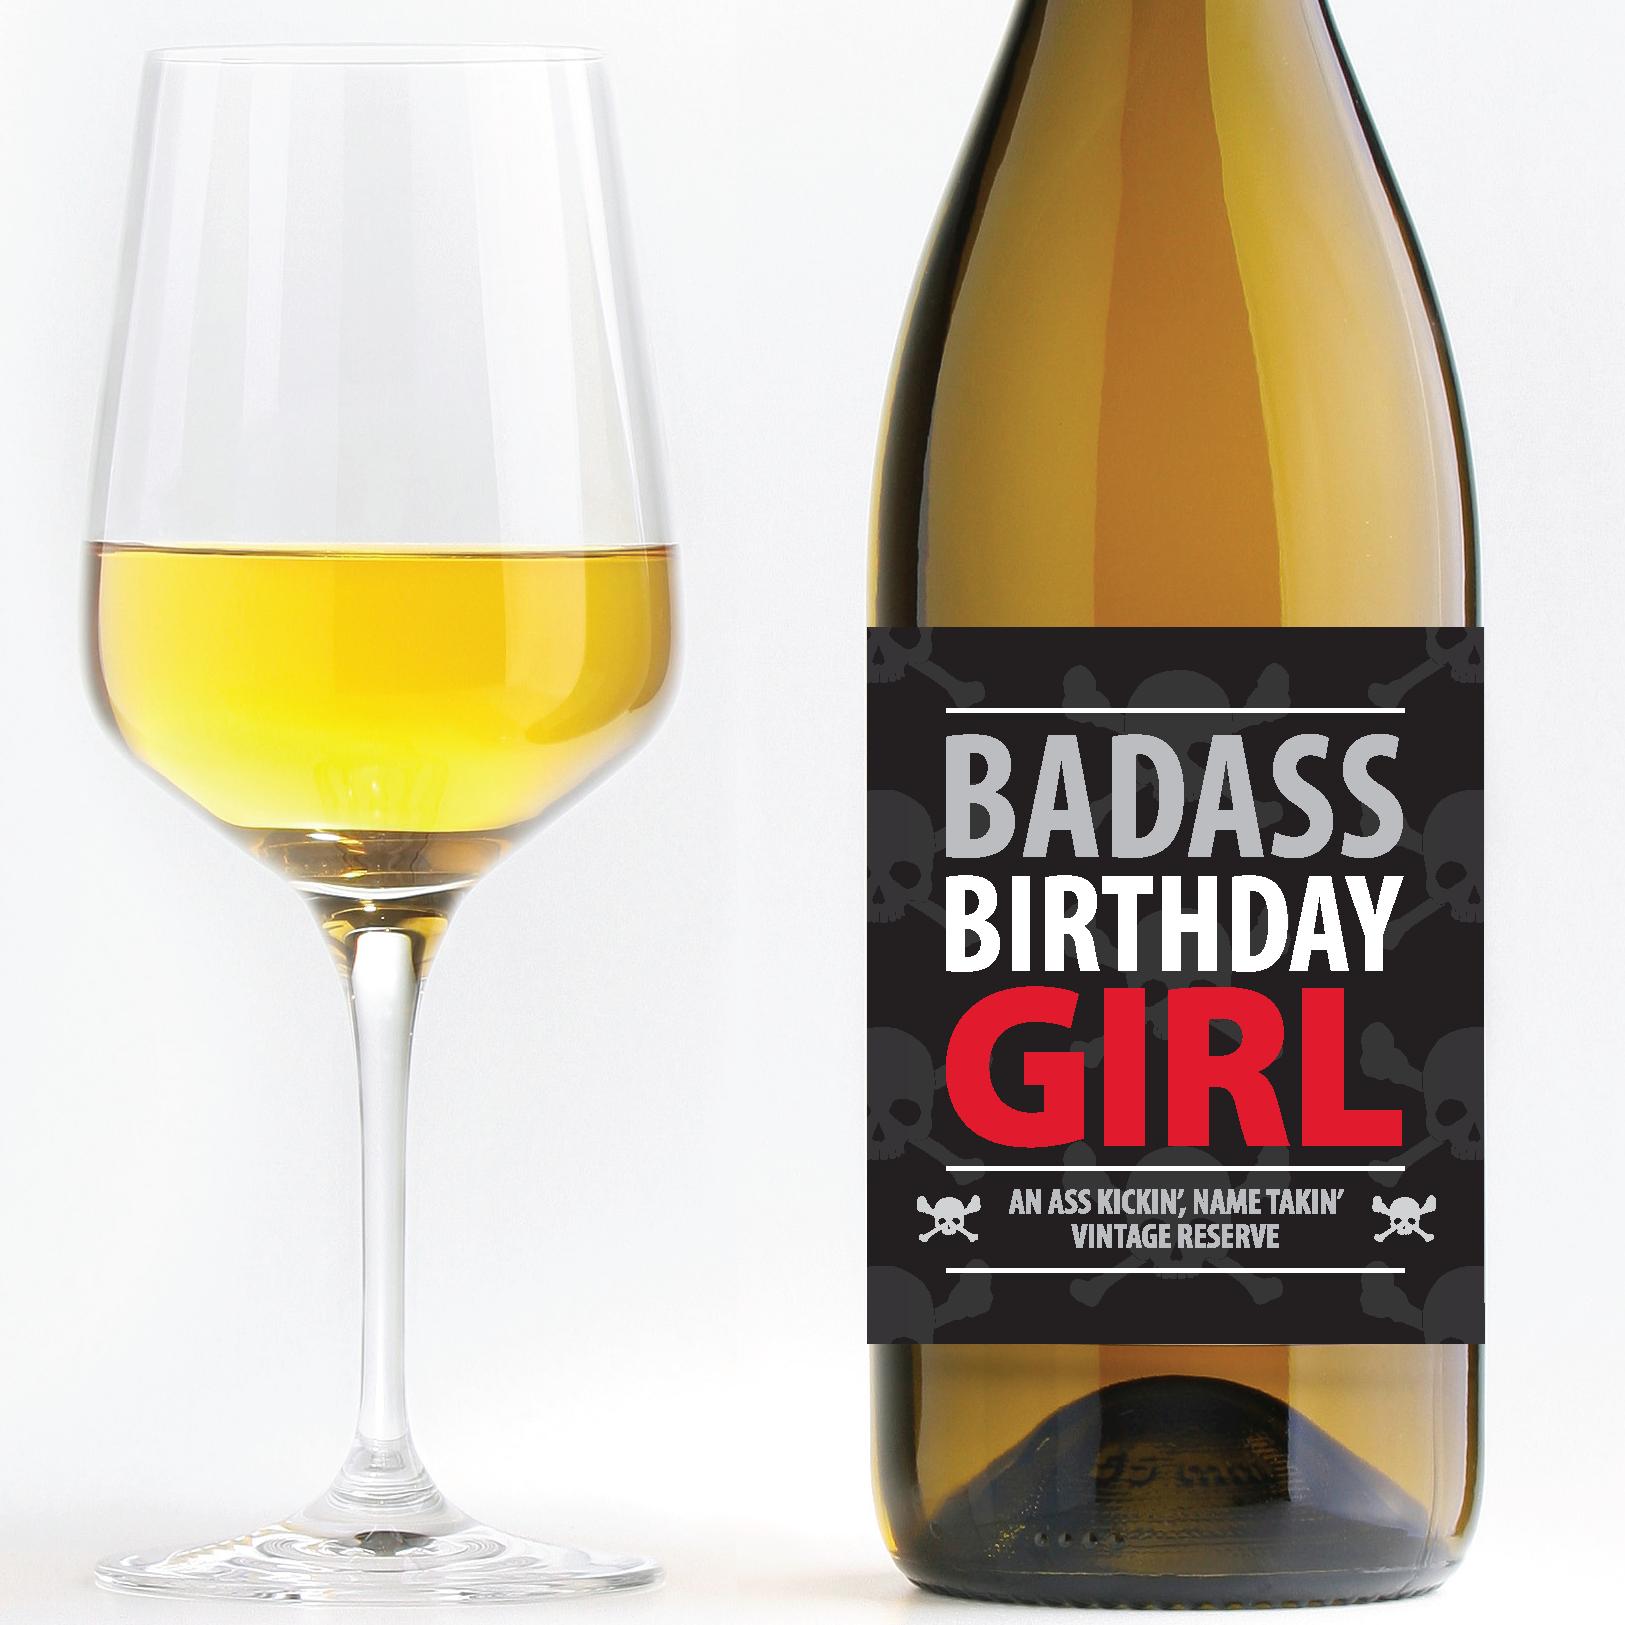 Birthday Wine Png - Badass Birthday Girl U2013 Birthday Wine Hdpng.com , Transparent background PNG HD thumbnail